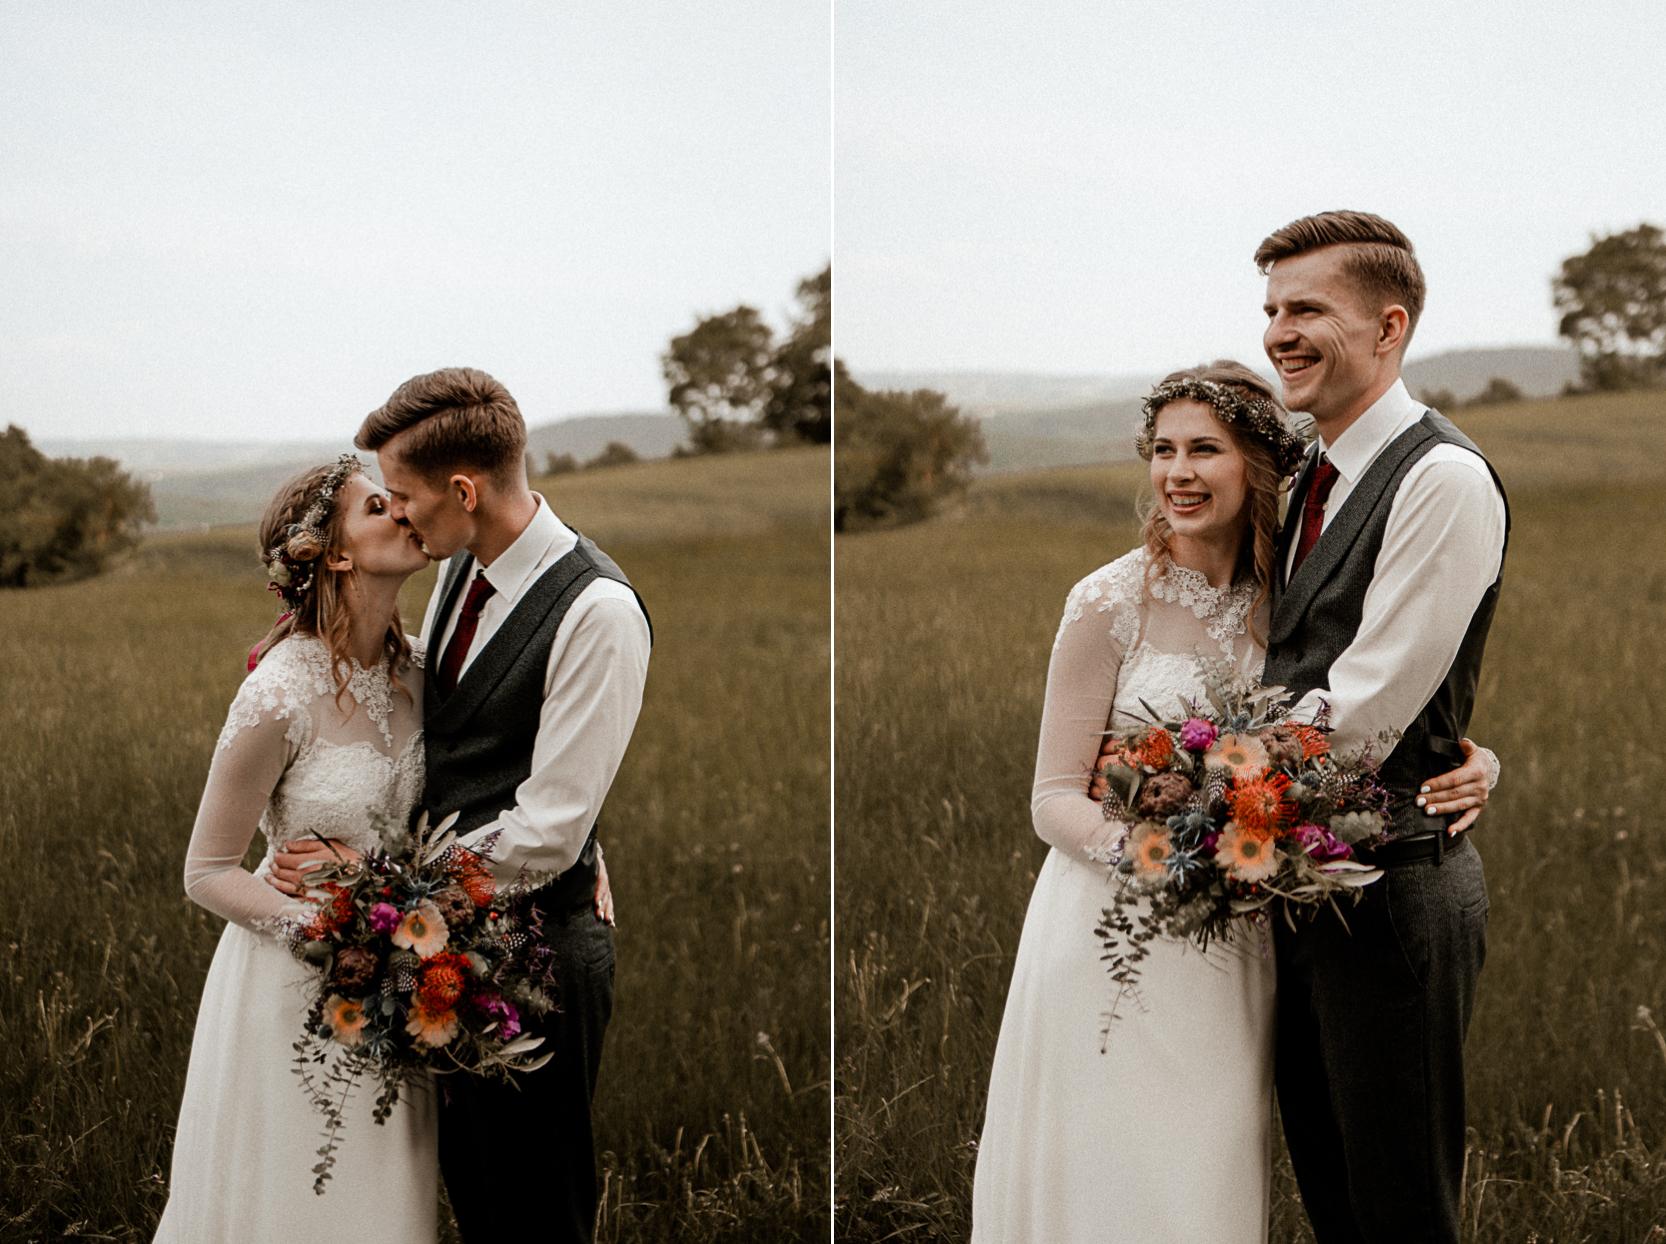 wholeheartedweddings-TimoMatthies-weddingphotography-moody-Melanie-Henrick-Mannheim-075.jpg